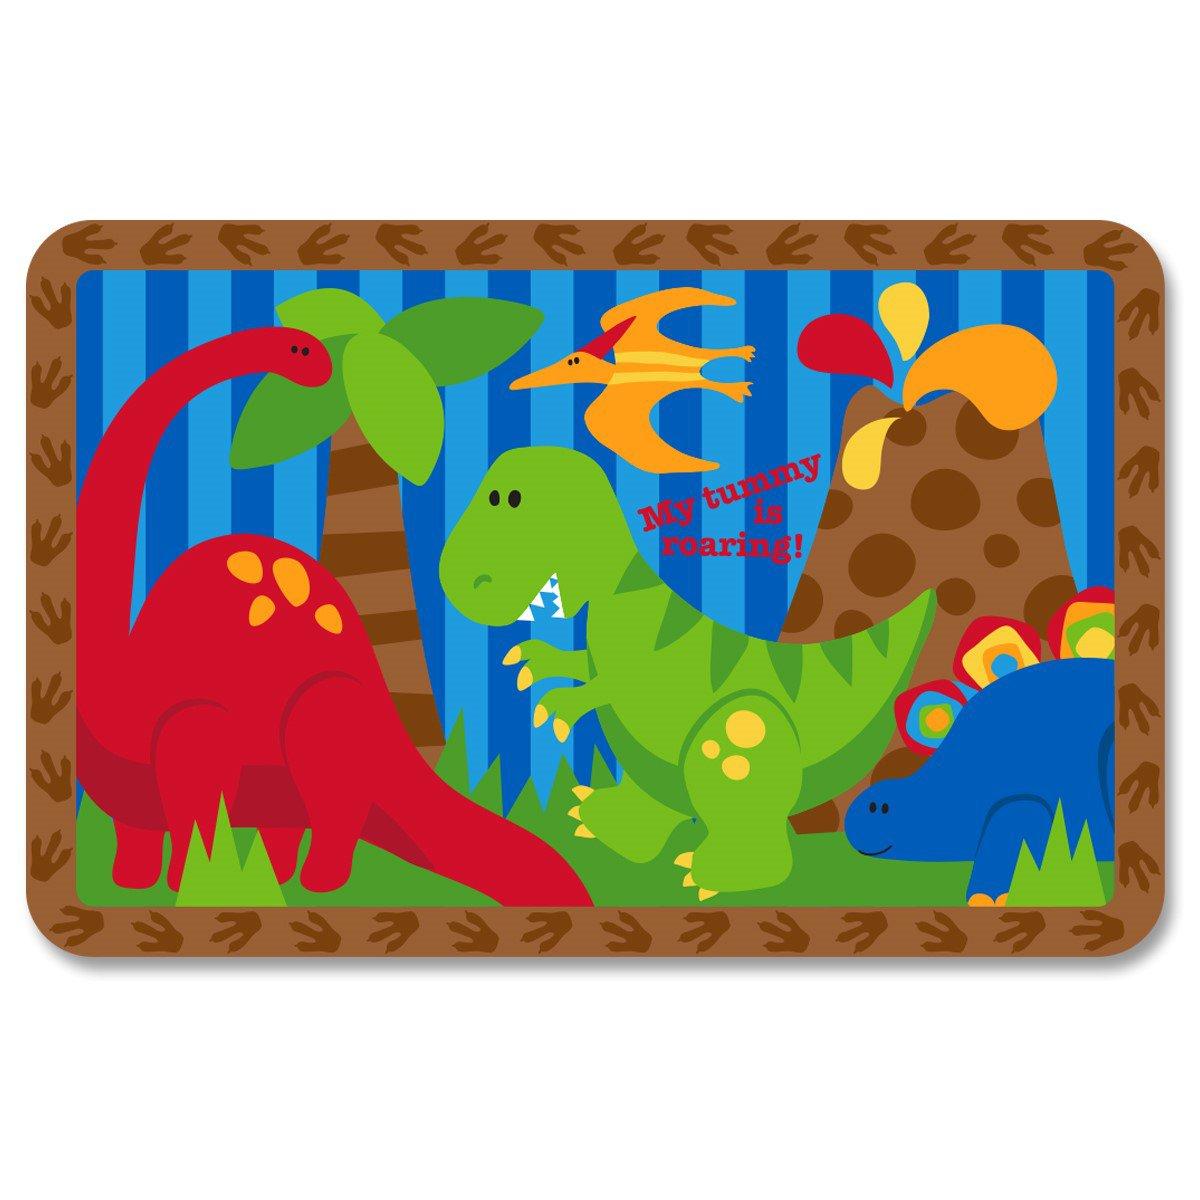 Stephen Joseph Fun and Educational Child Placemats (Dino) by Stephen Joseph   B00NVR4BV8